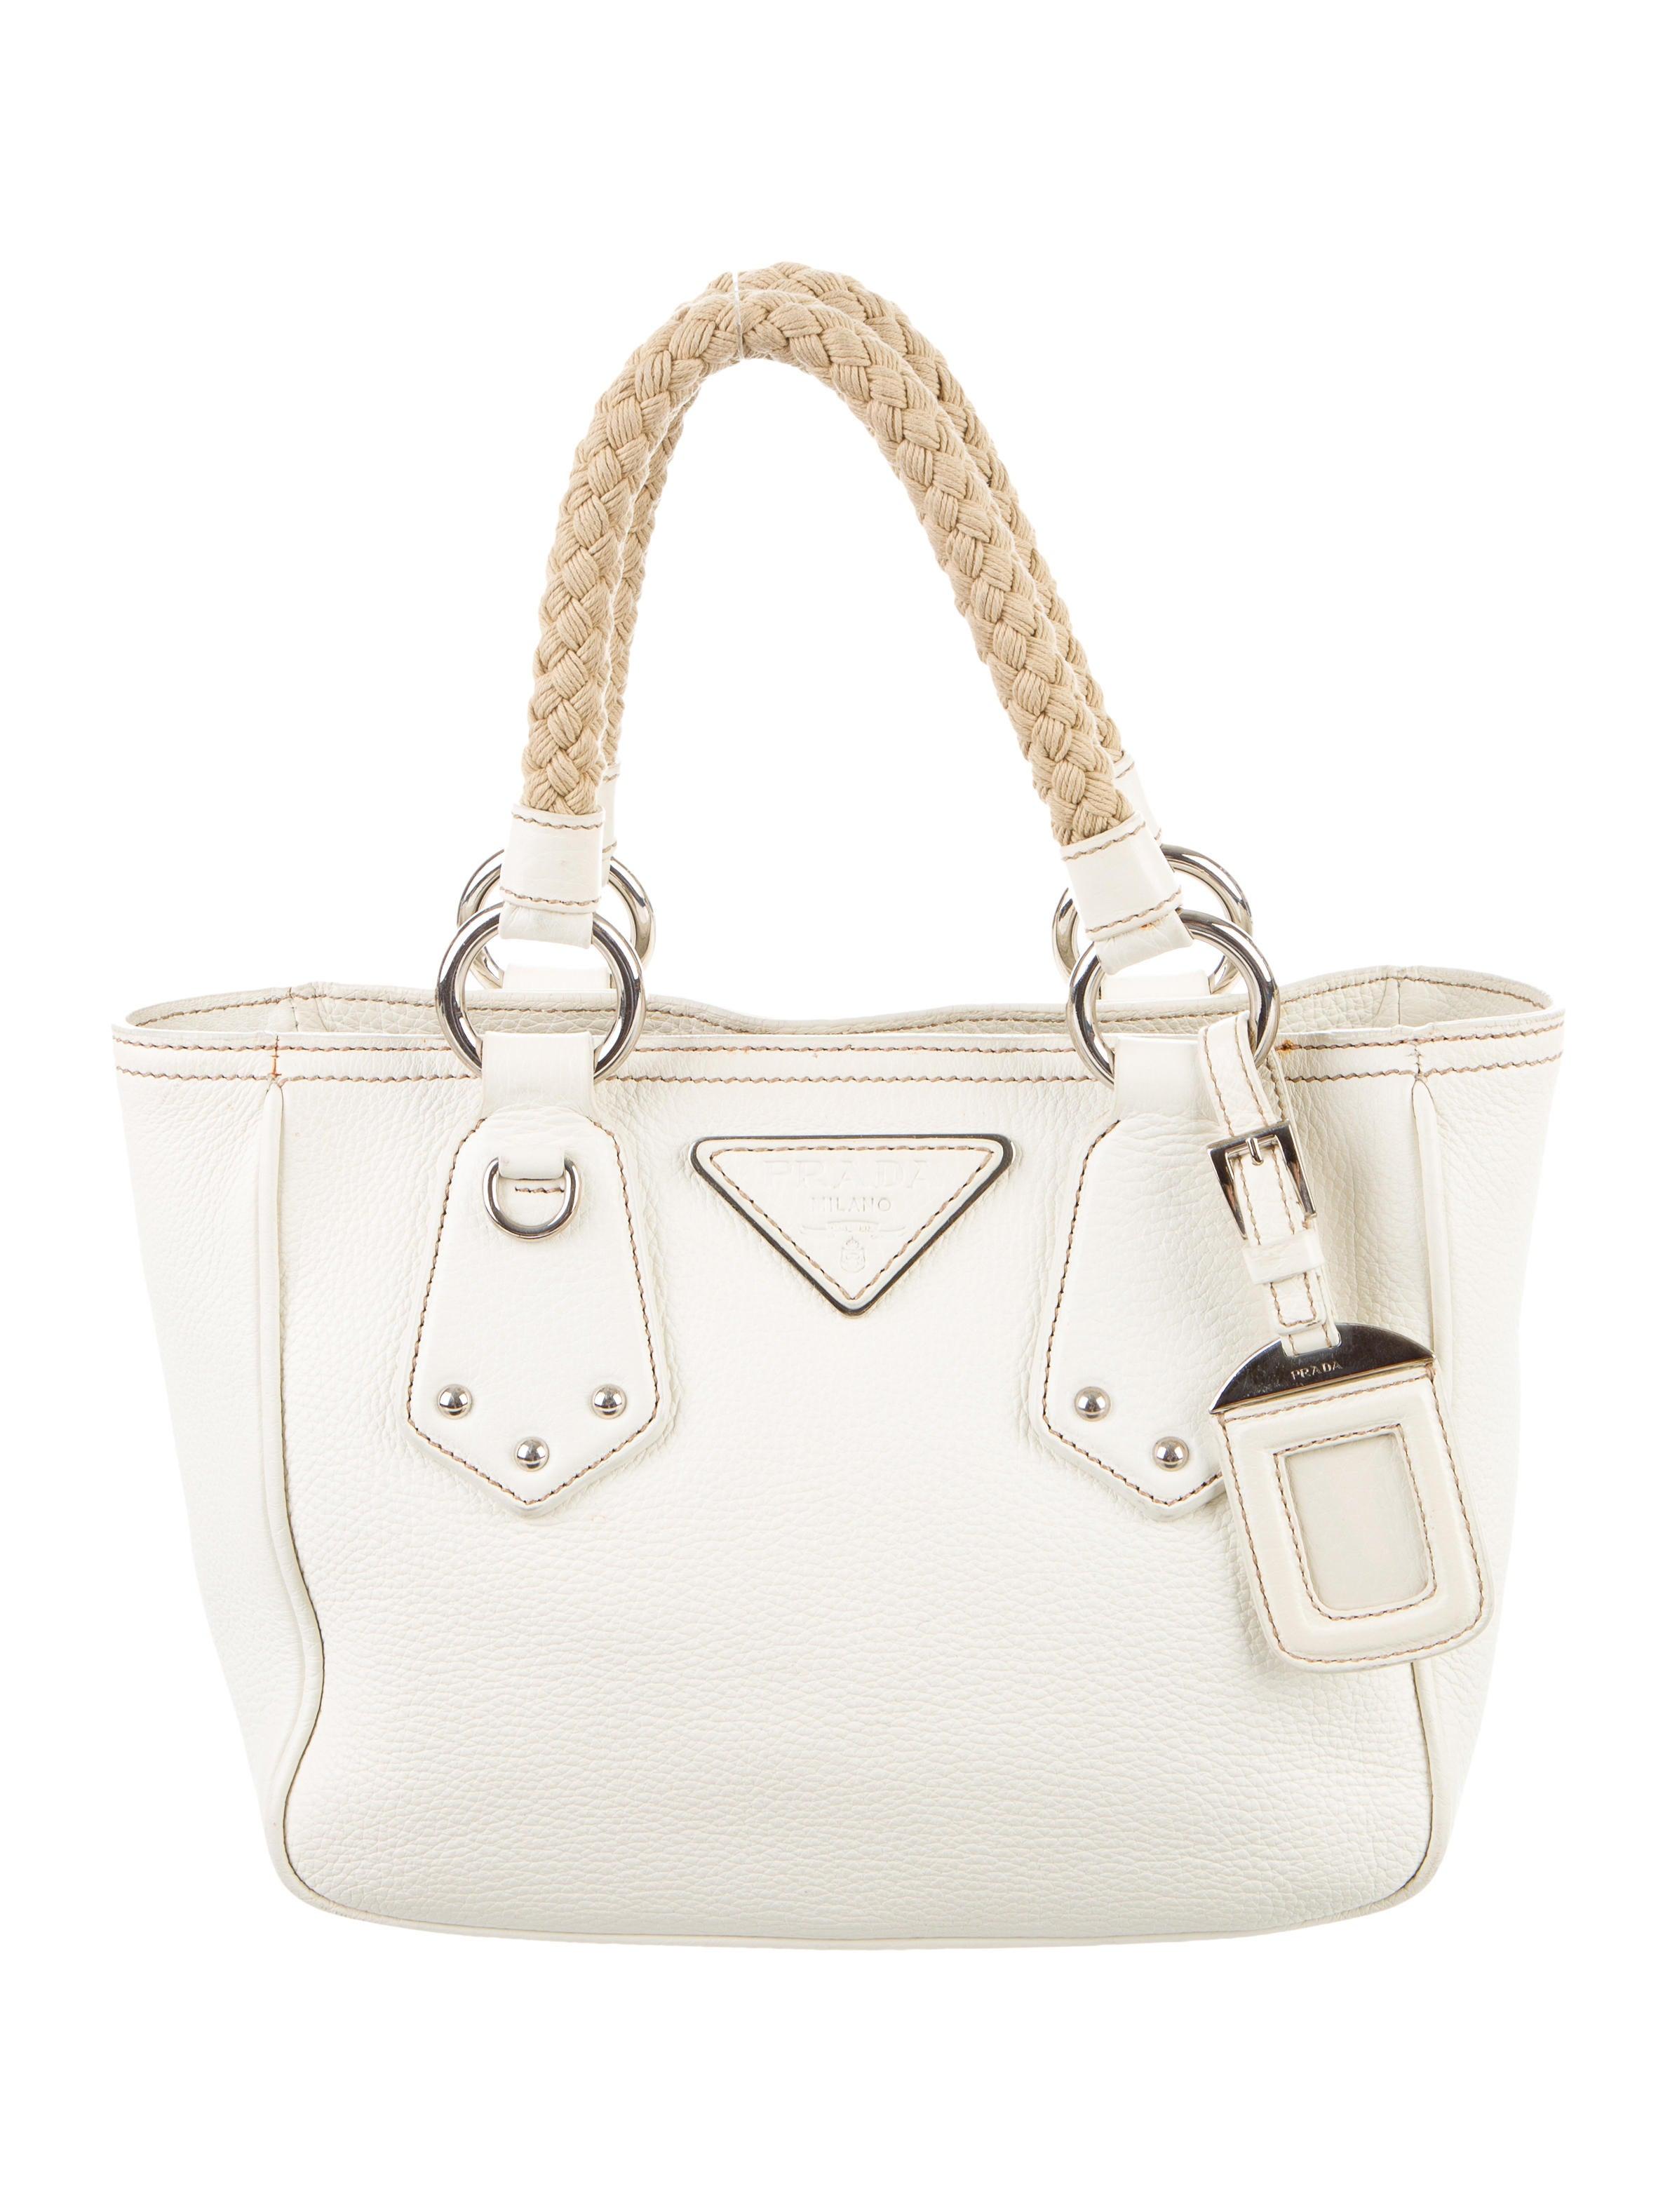 95bfb4923f4b Prada Vitello Daino Rope Handle Bag - Handbags - PRA160389